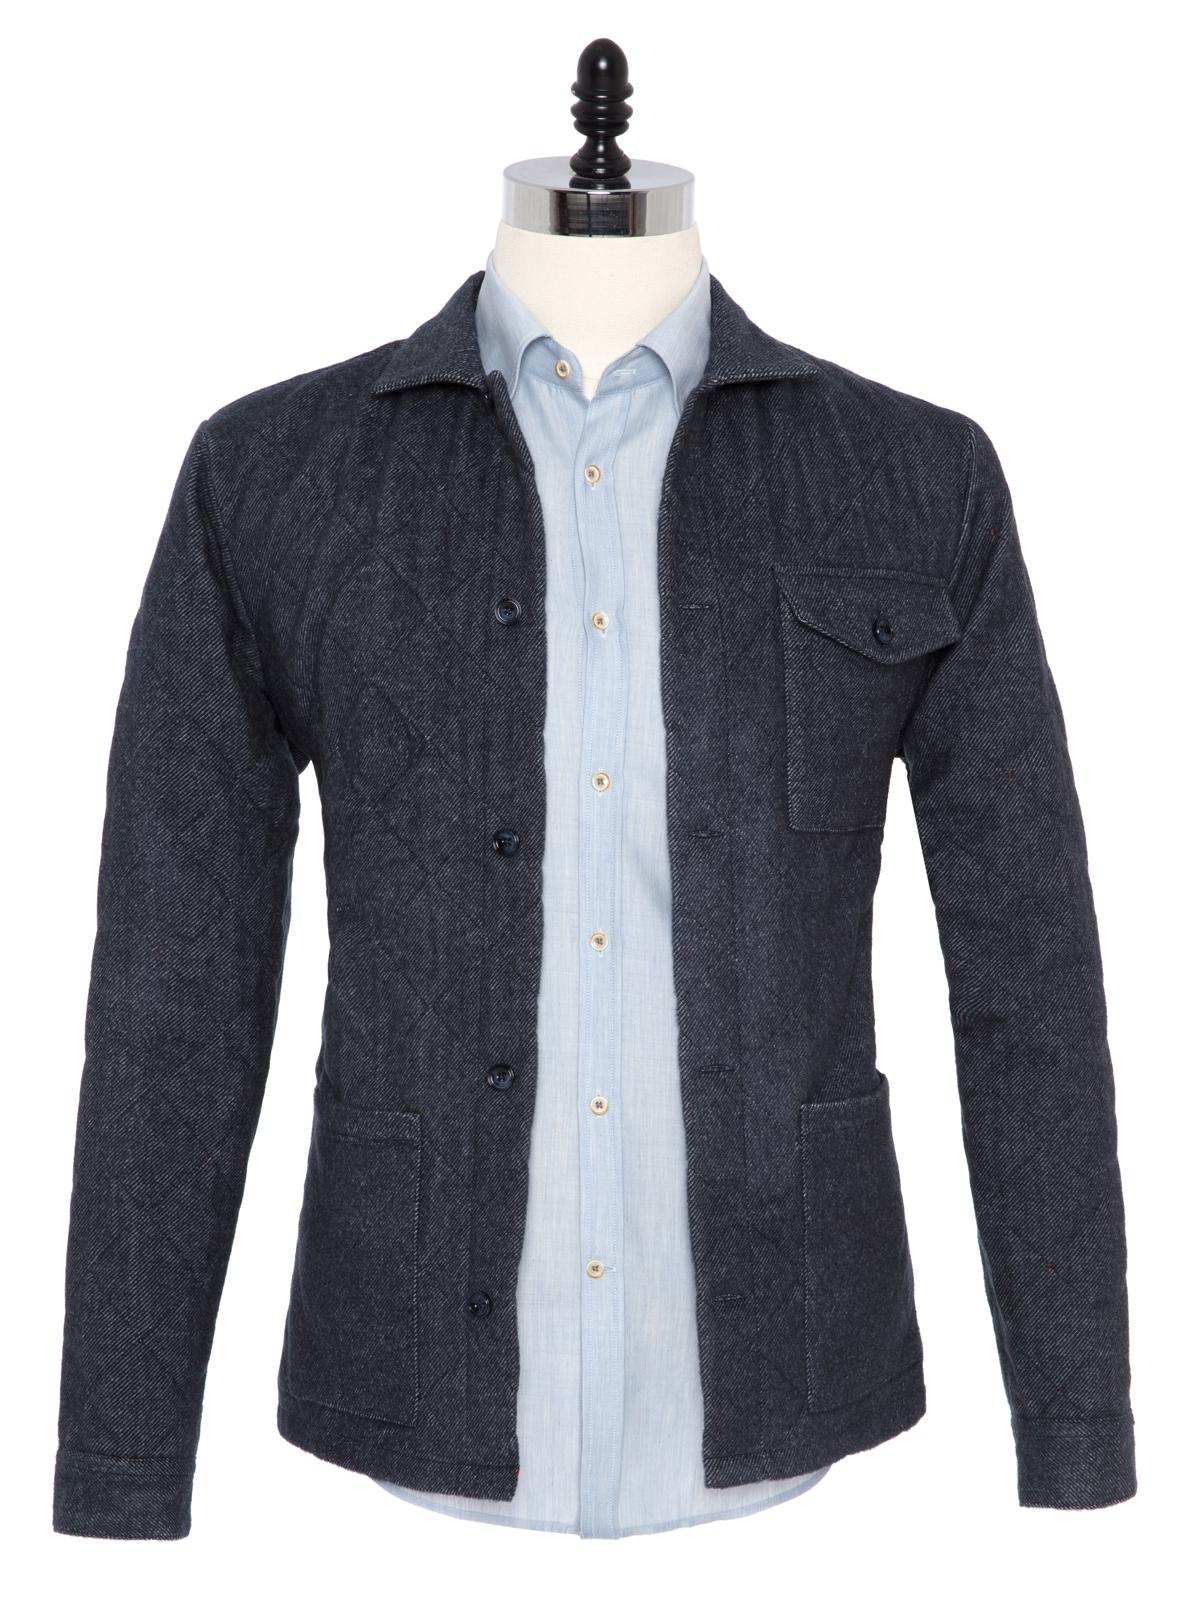 Germirli - Germirli Füme Kapitone Tailor Fit Ceket Gömlek